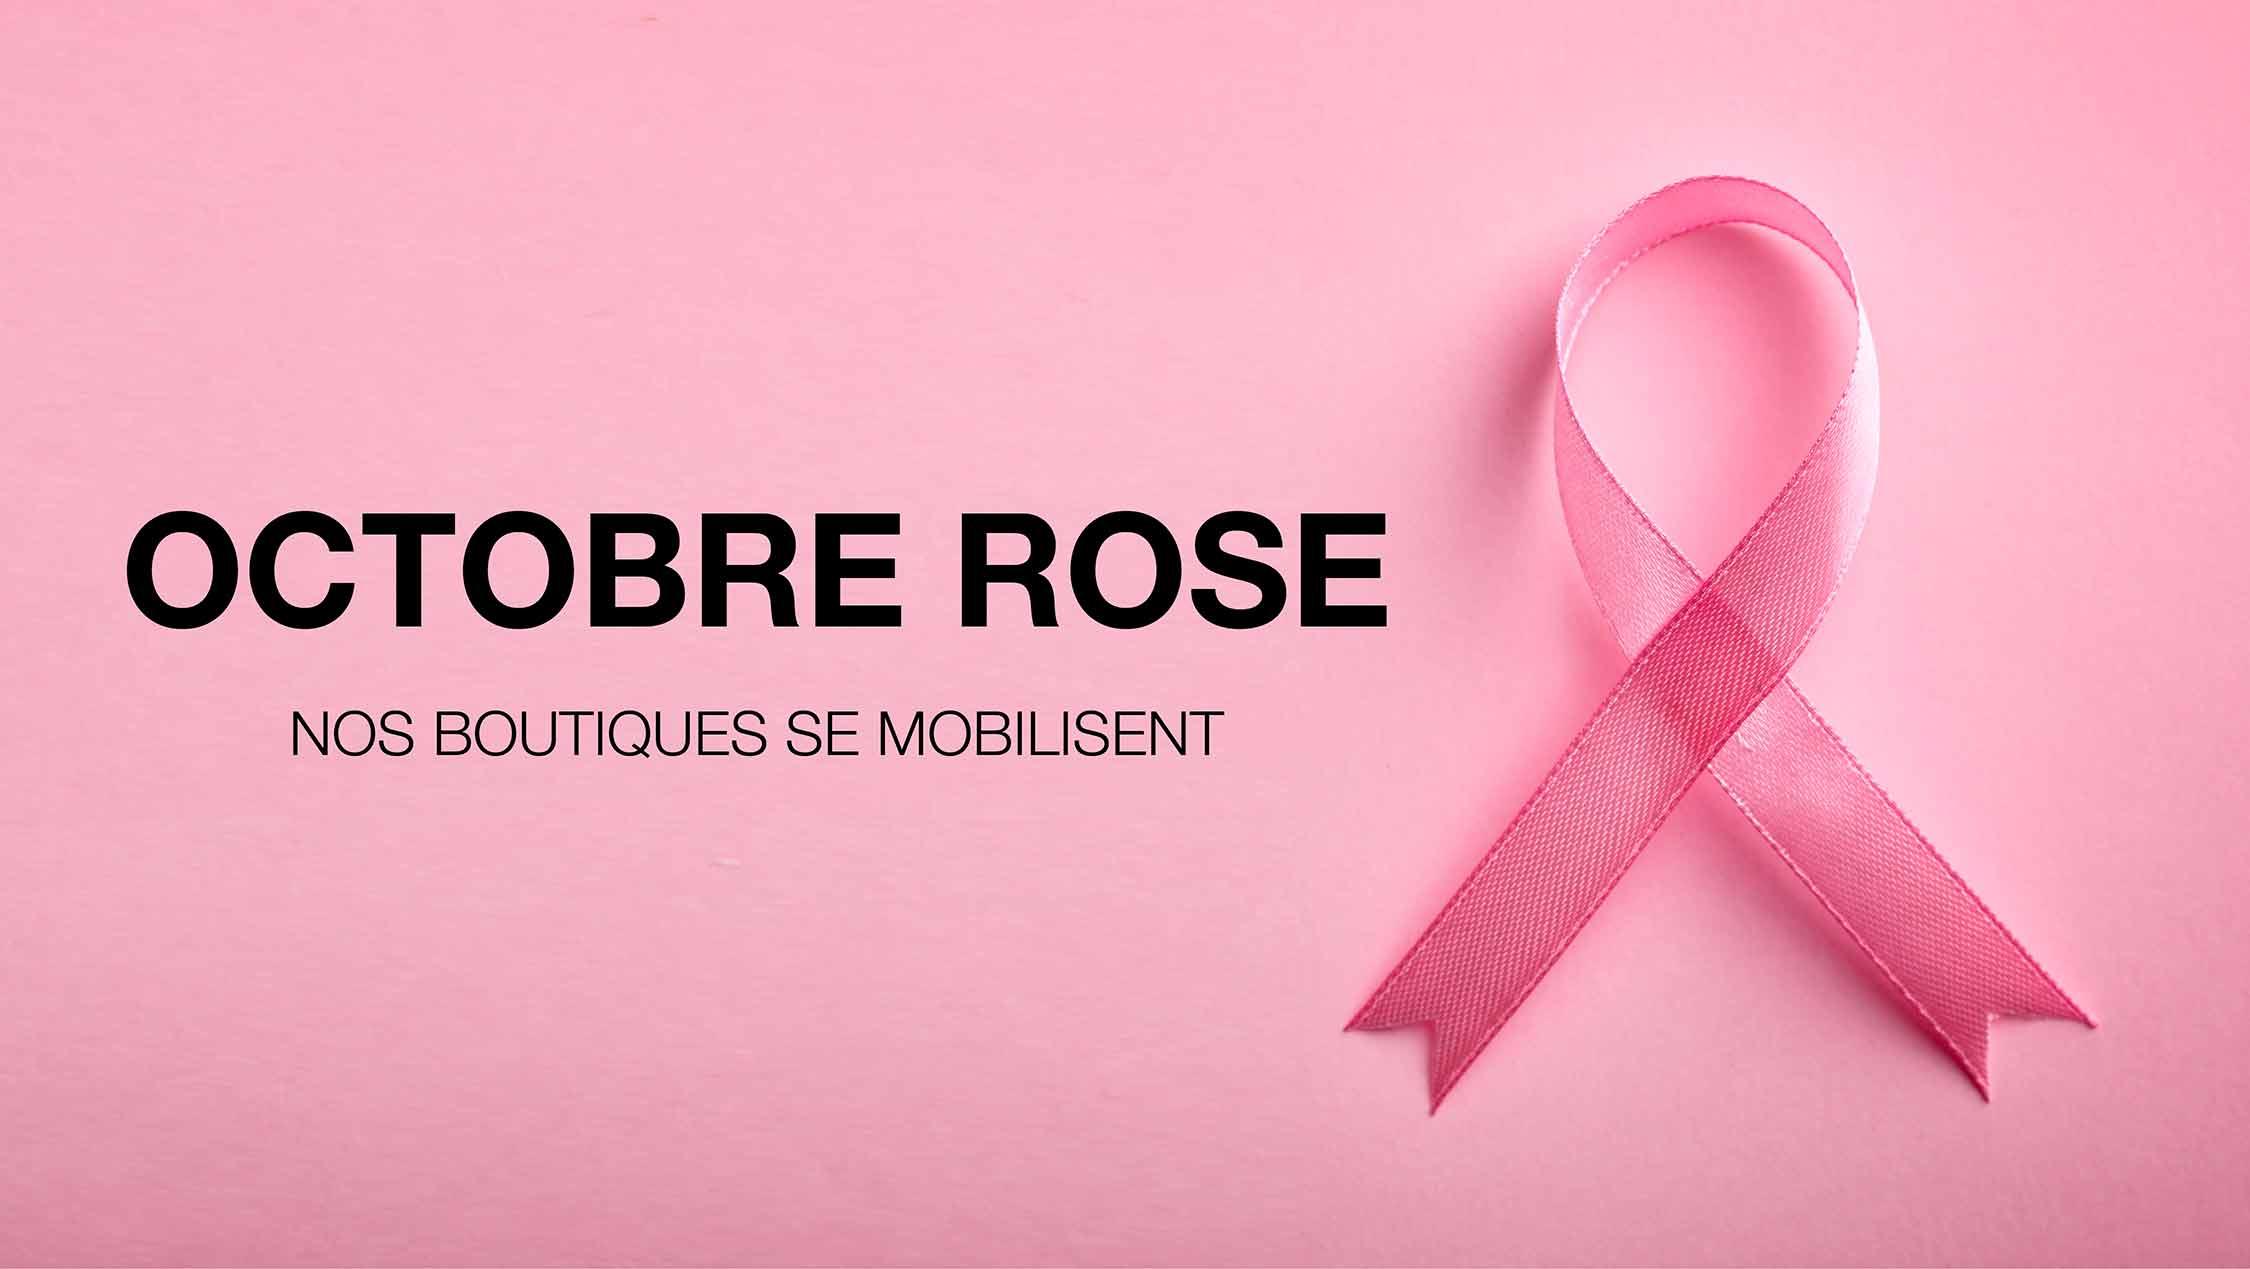 Octobre rose : vos boutiques se mobilisent !